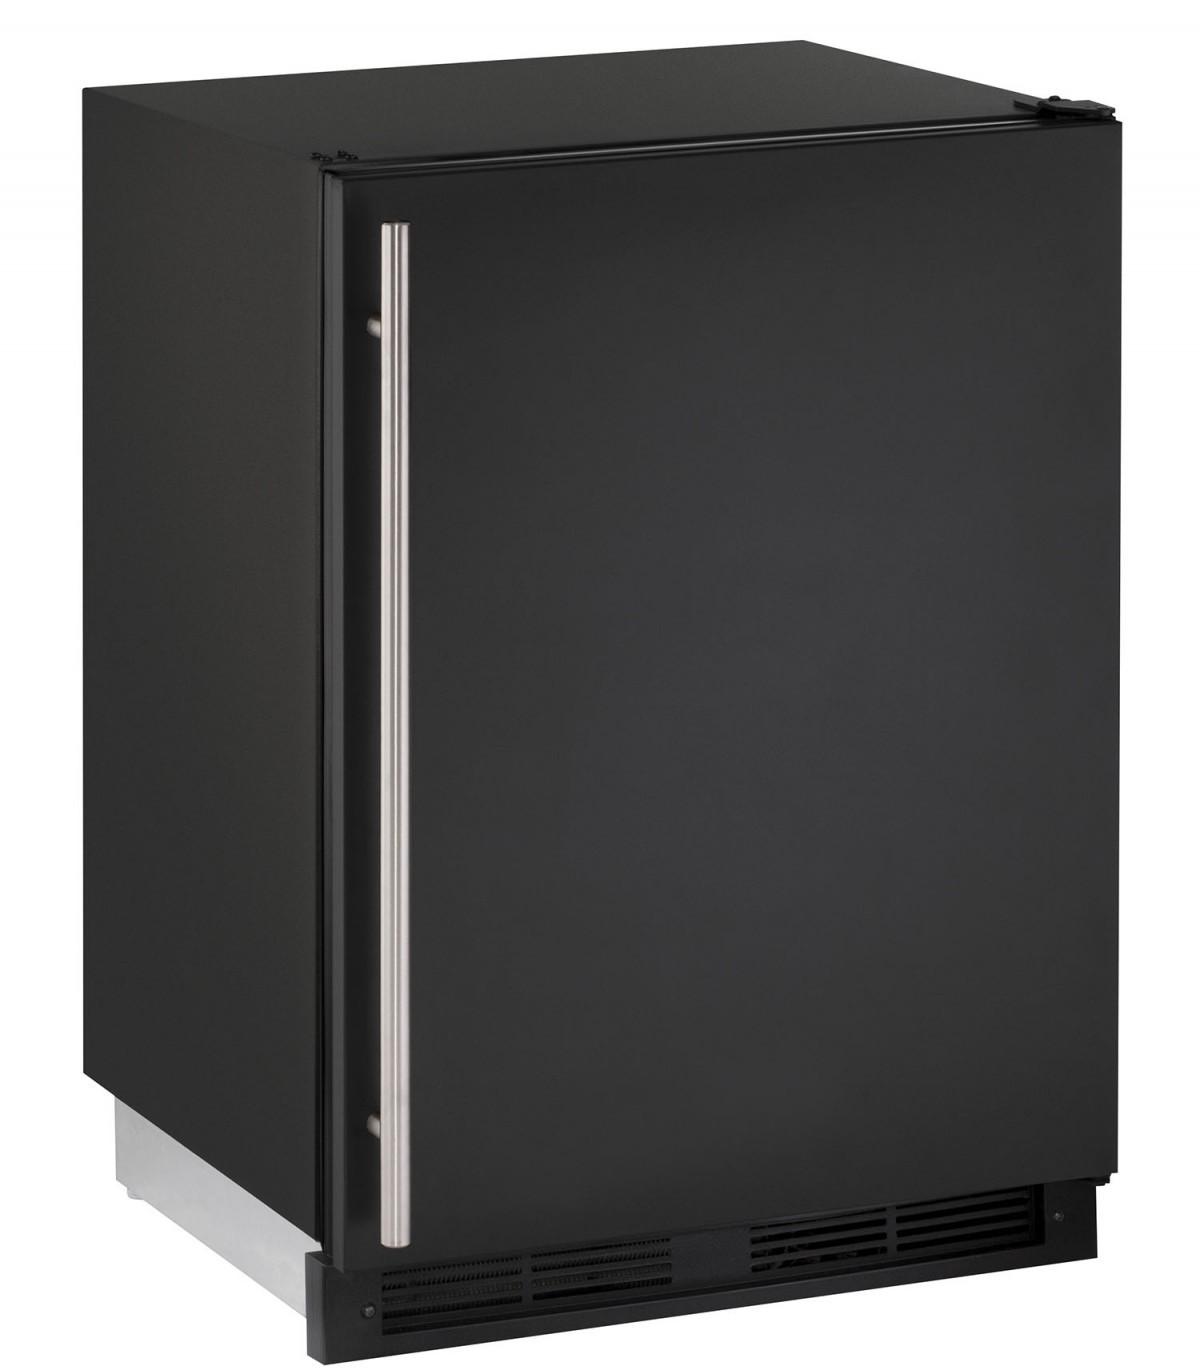 Compact Refrigerators & Mini Fridges | AJ Madison